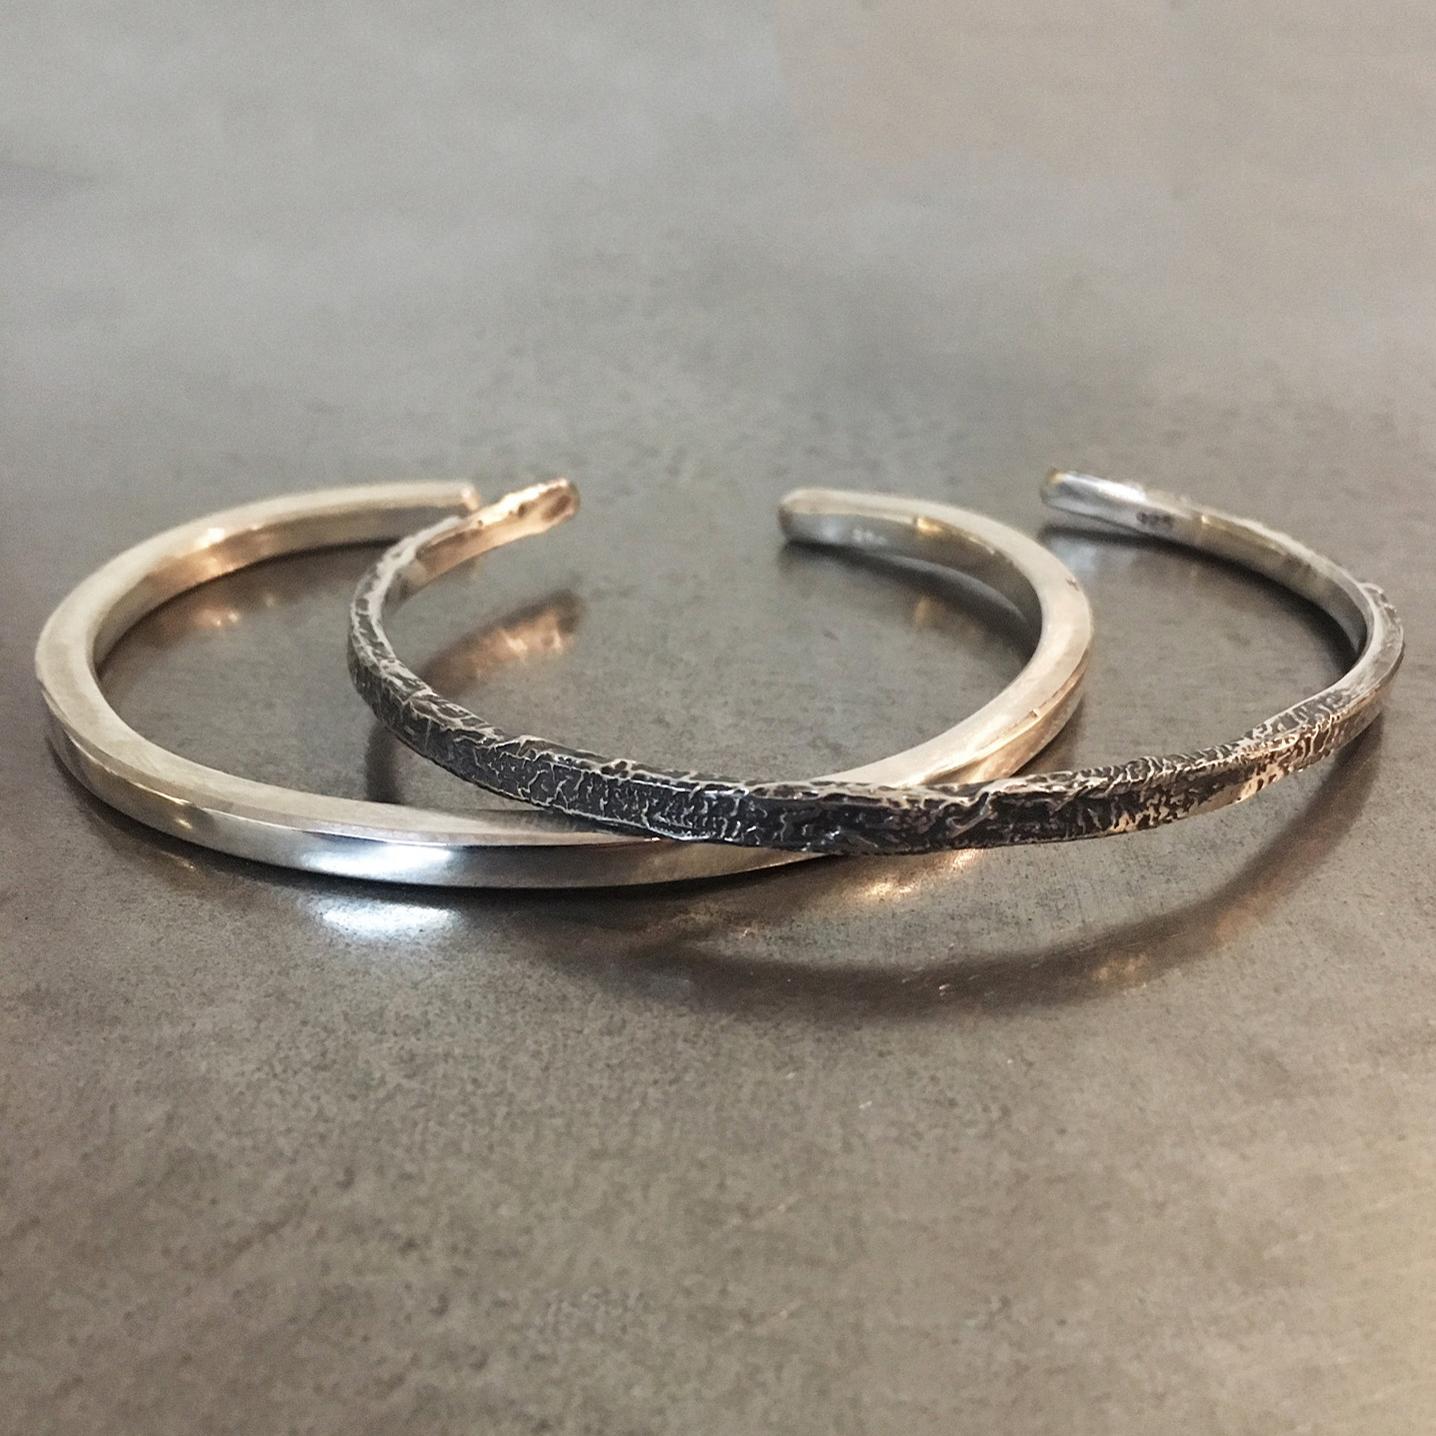 Organic Unisex Silver Cuff Bracelets